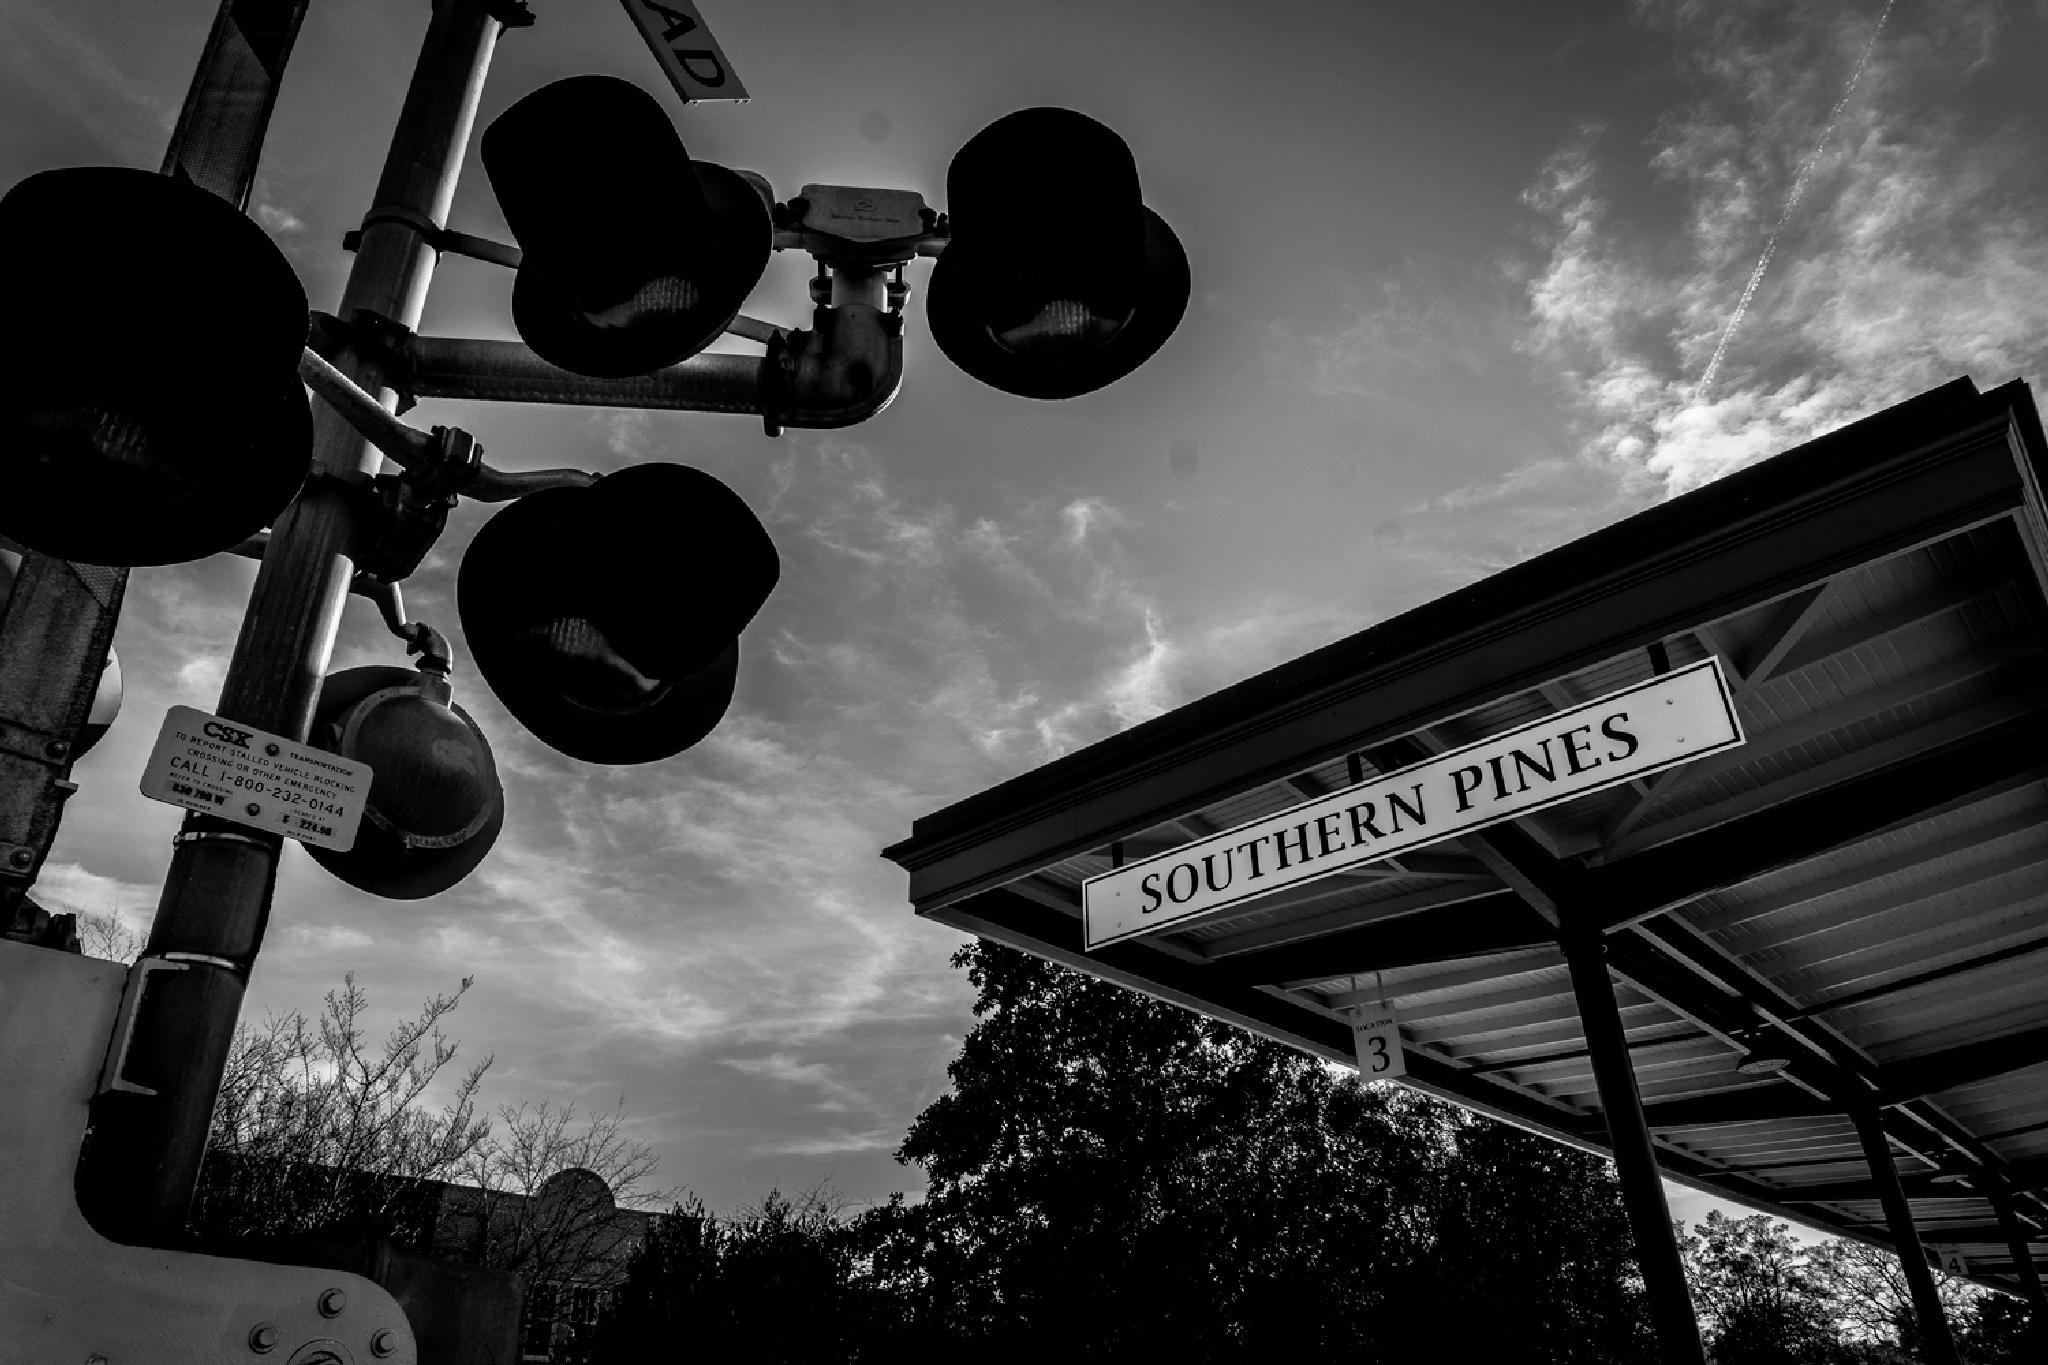 Lights and the Plattform by NaturesVeiwsPhotography